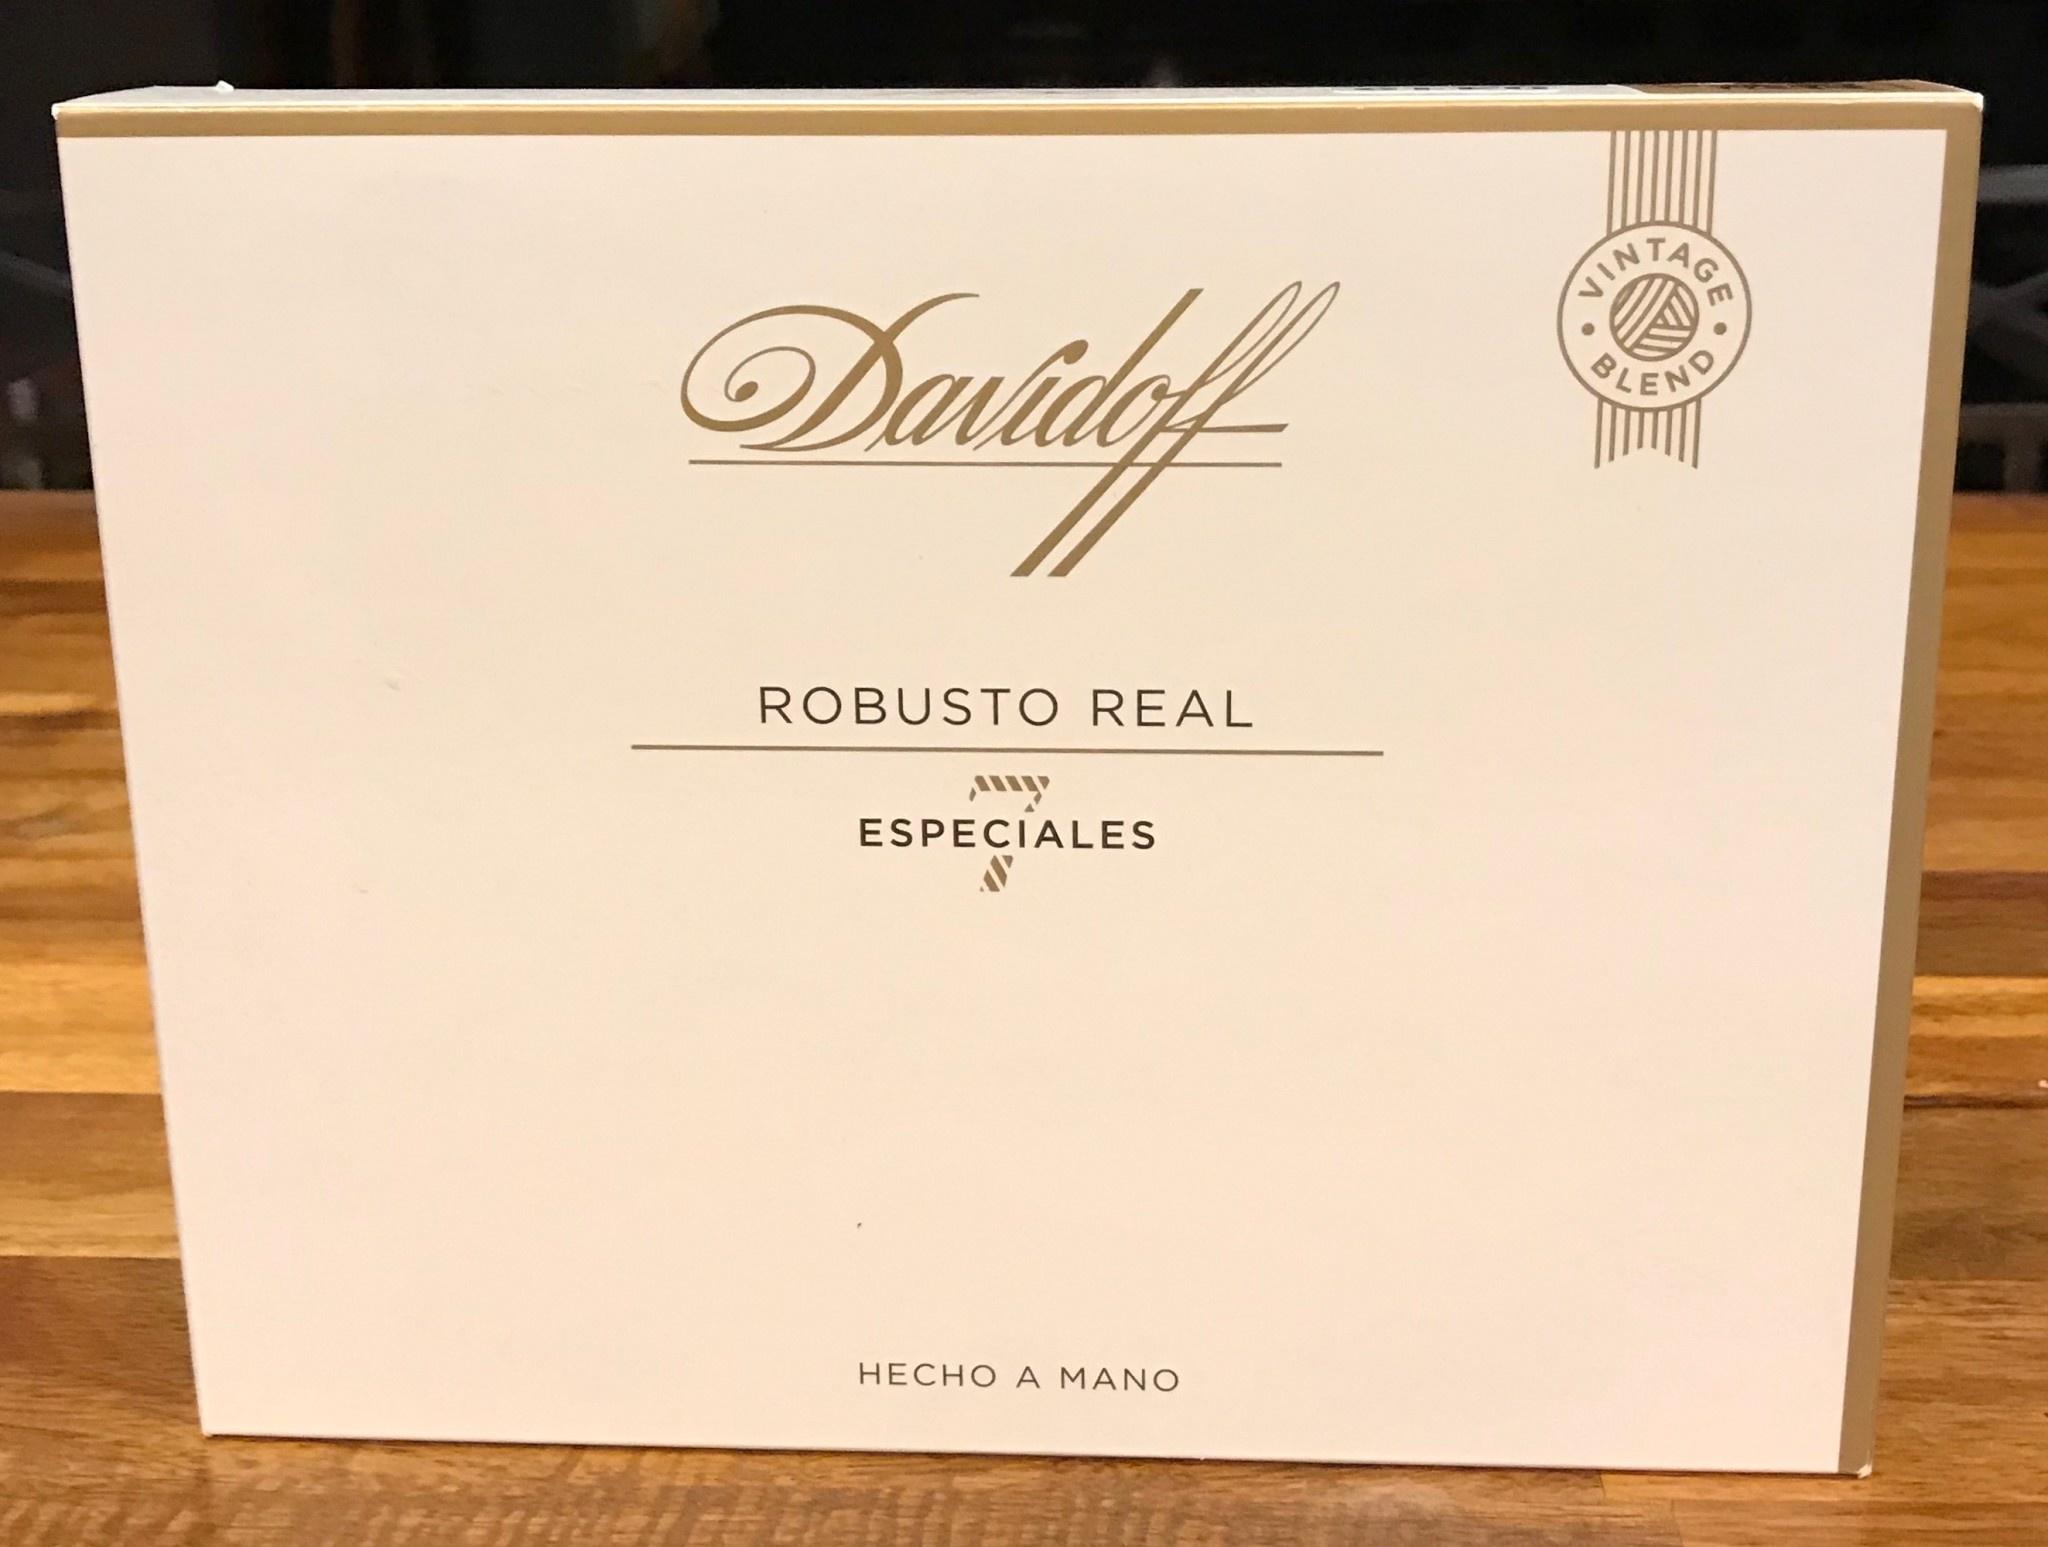 DAVIDOFF OF GENEVA DAVIDOFF LIMITED EDITION LE 2019 ROBUSTO REAL ESPECIALES 7 single